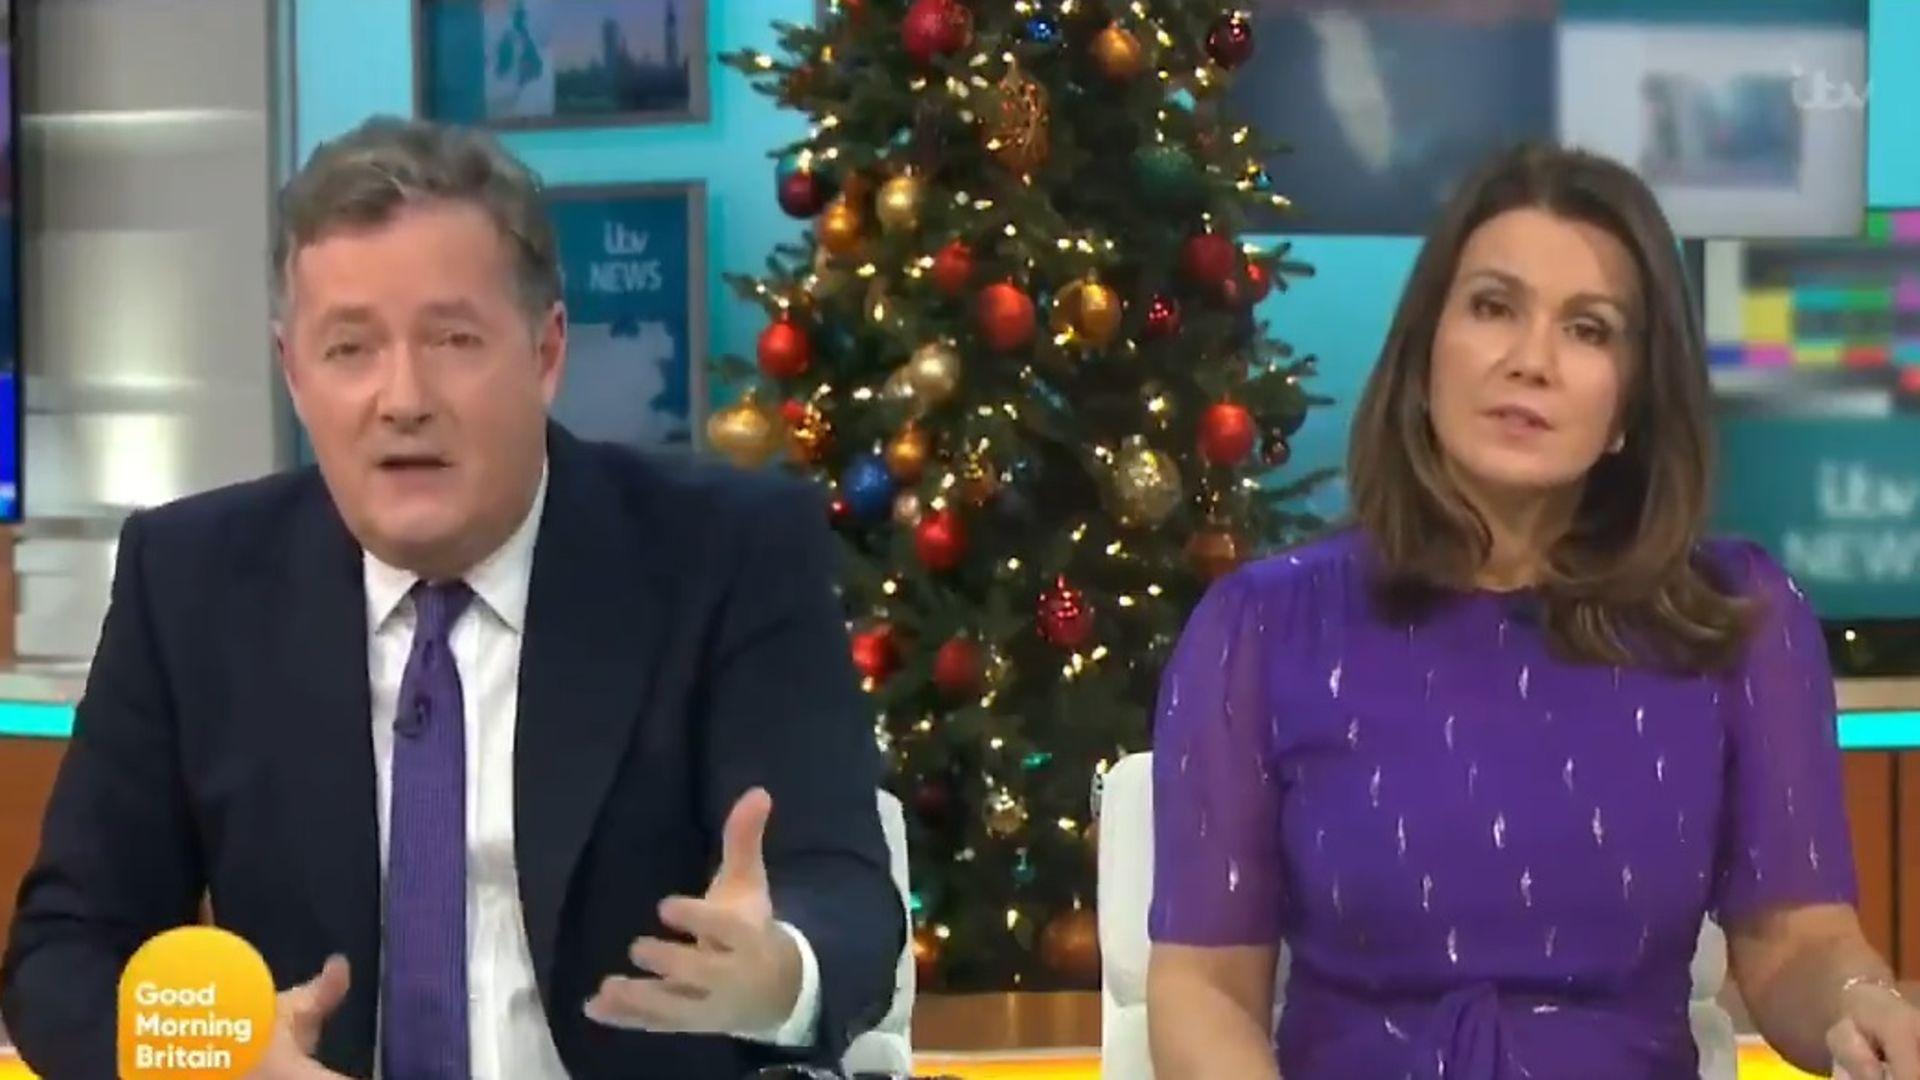 Piers Morgan and Susanna Reid tear apart Laurence Fox's lockdown tweet - Credit: Good Morning Britain/ITV